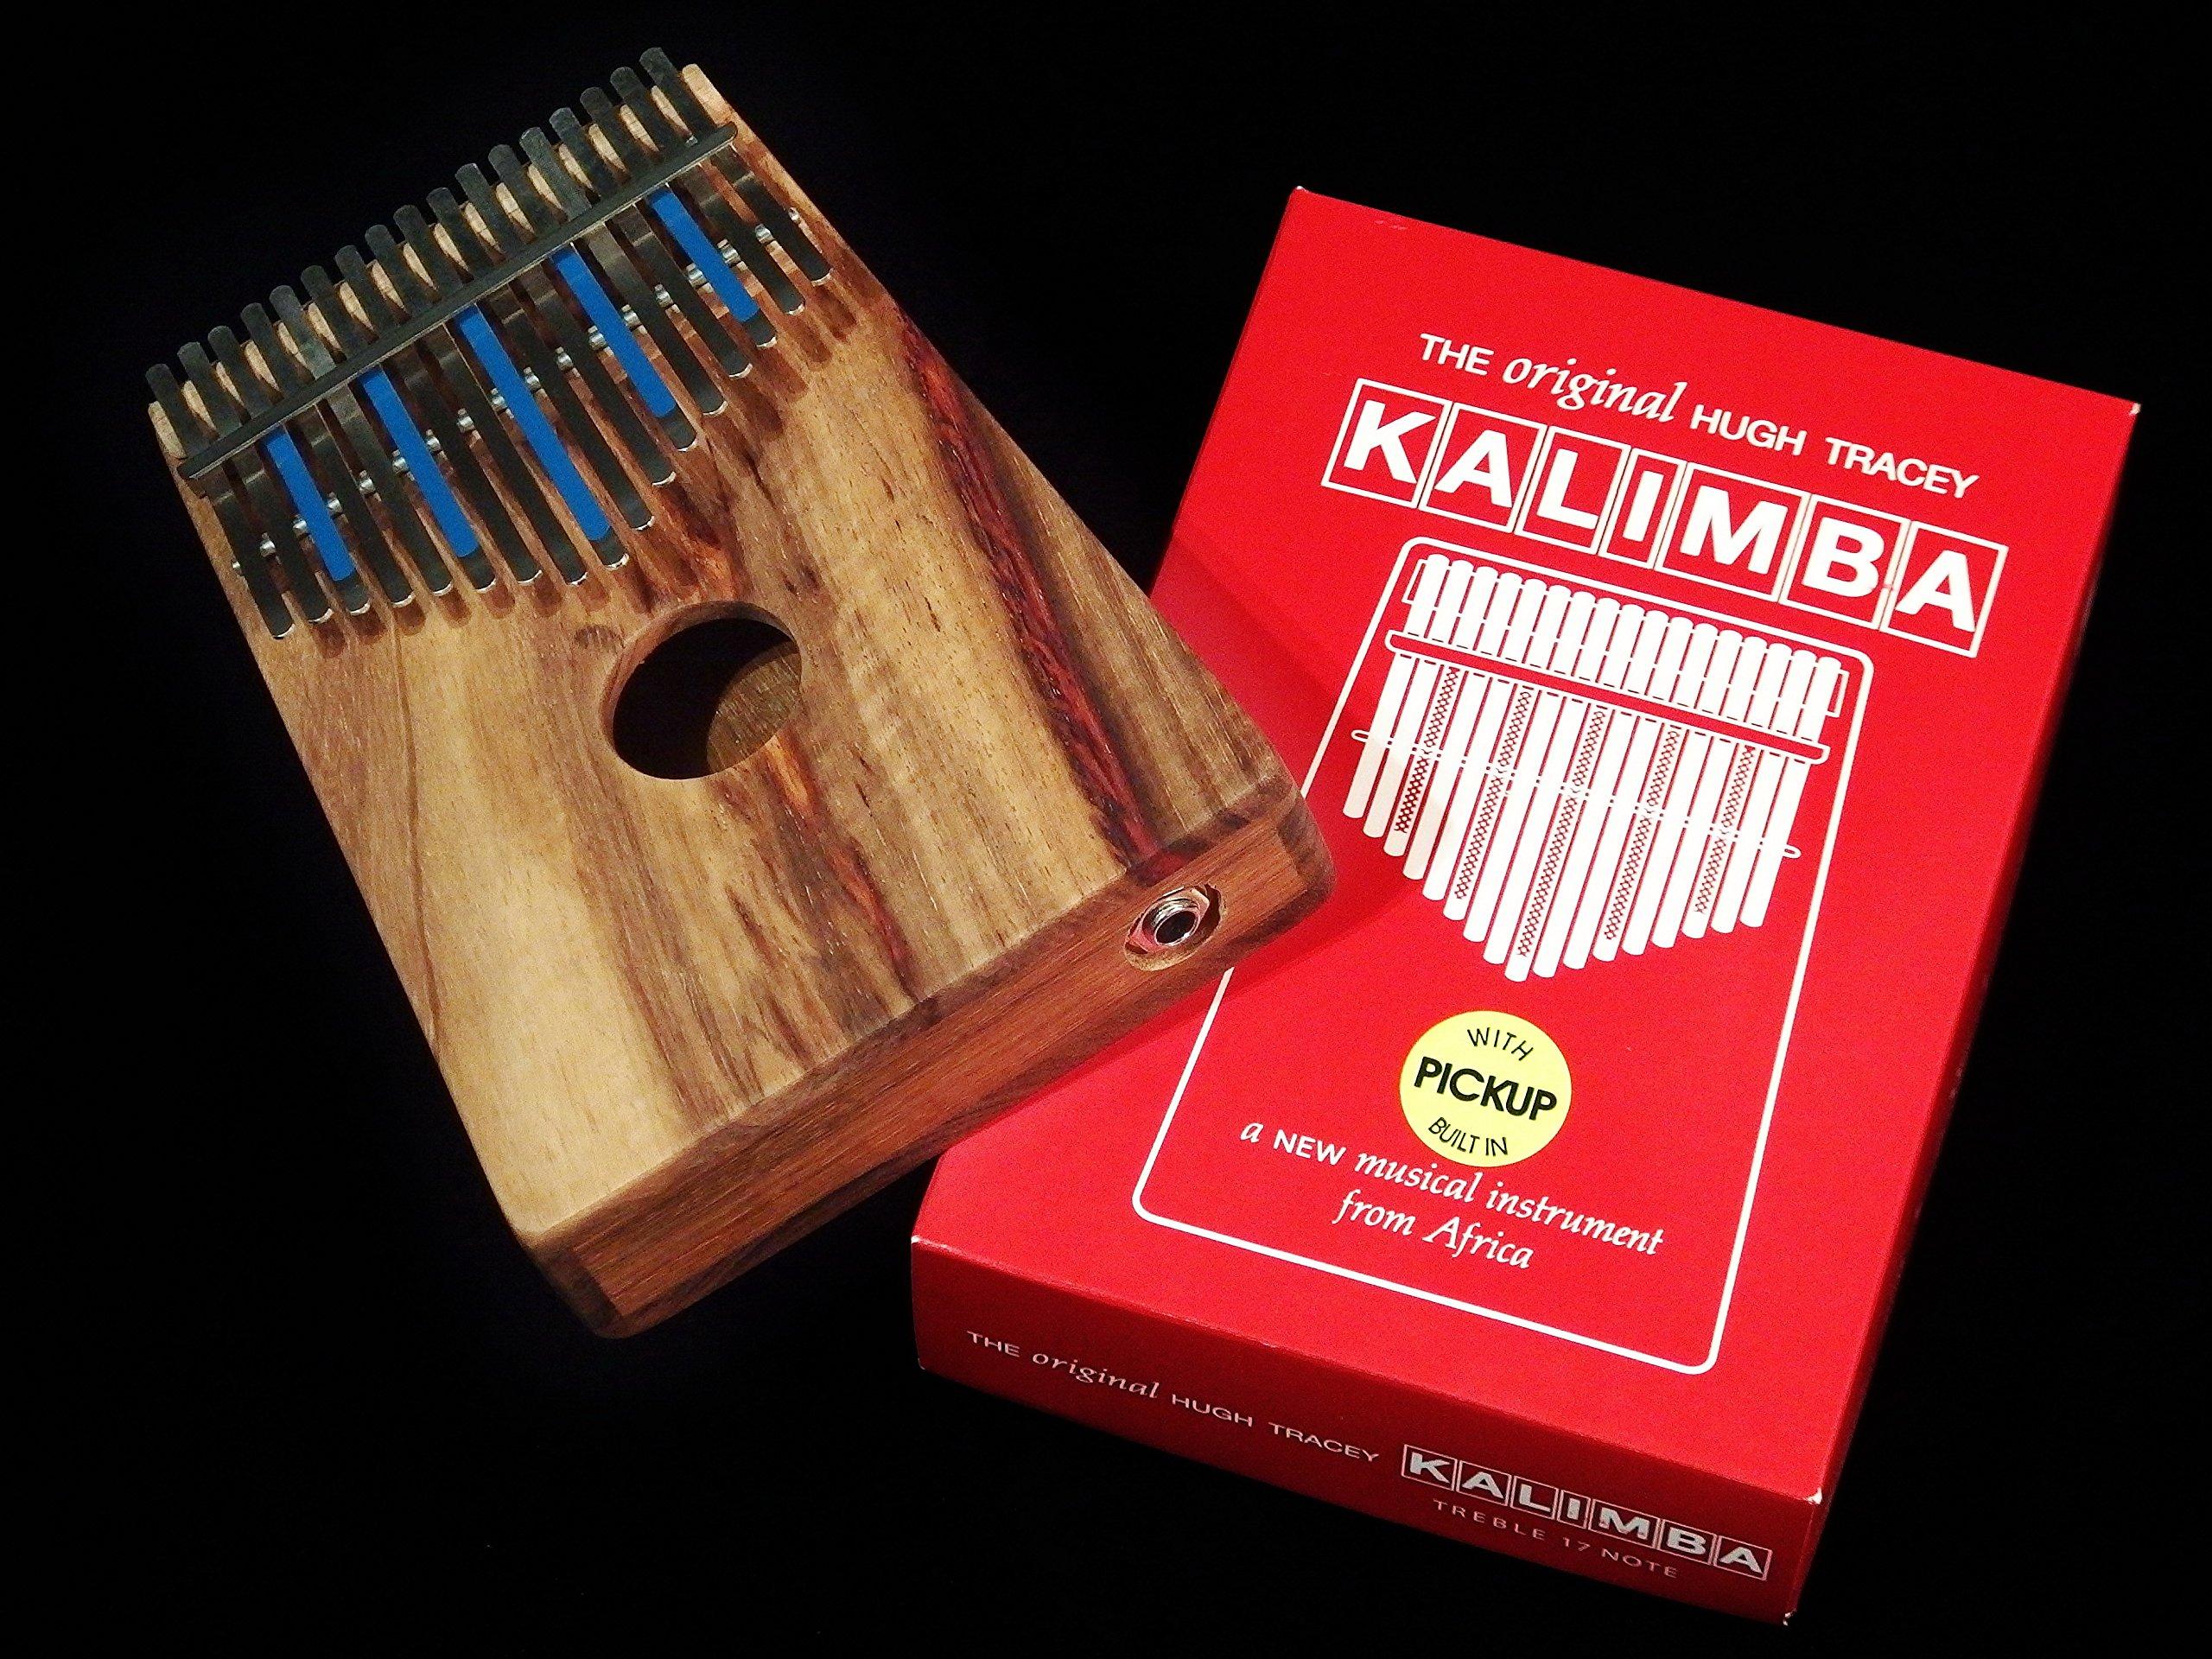 Kalimba Hugh Tracey Treble-17 Pickup Sansula Thumb Piano Great sound